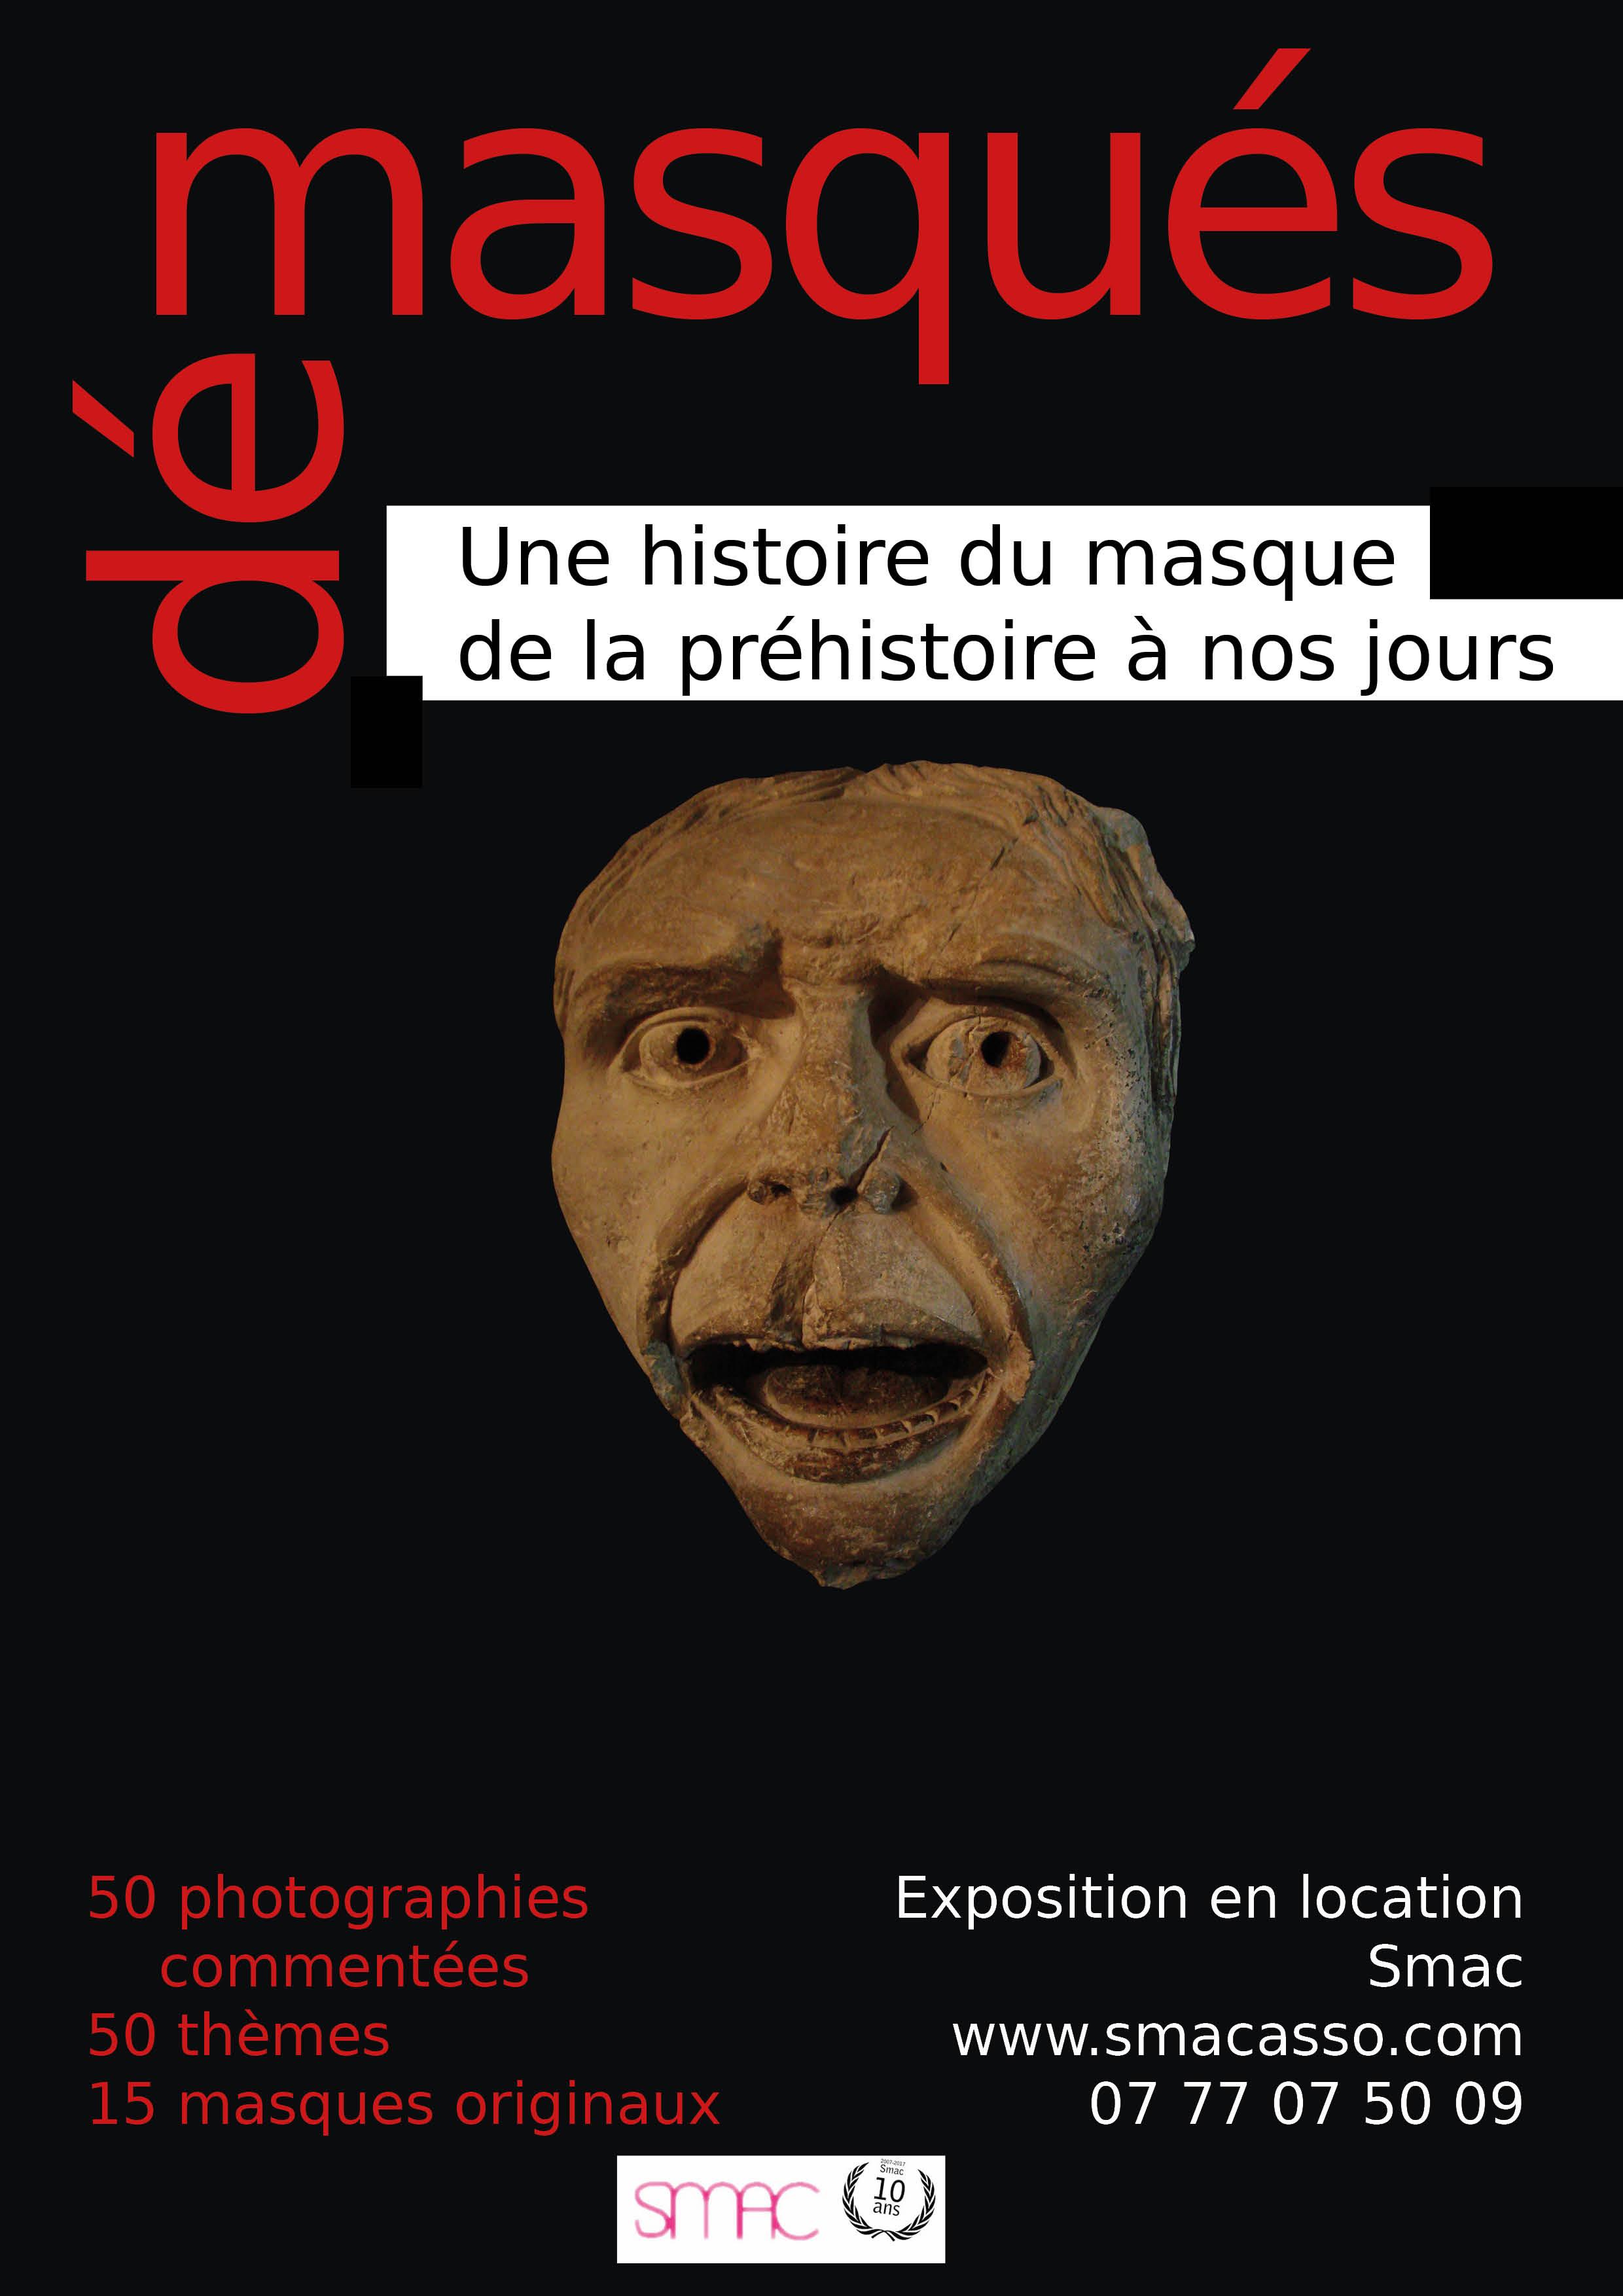 2017 (dé)masqués